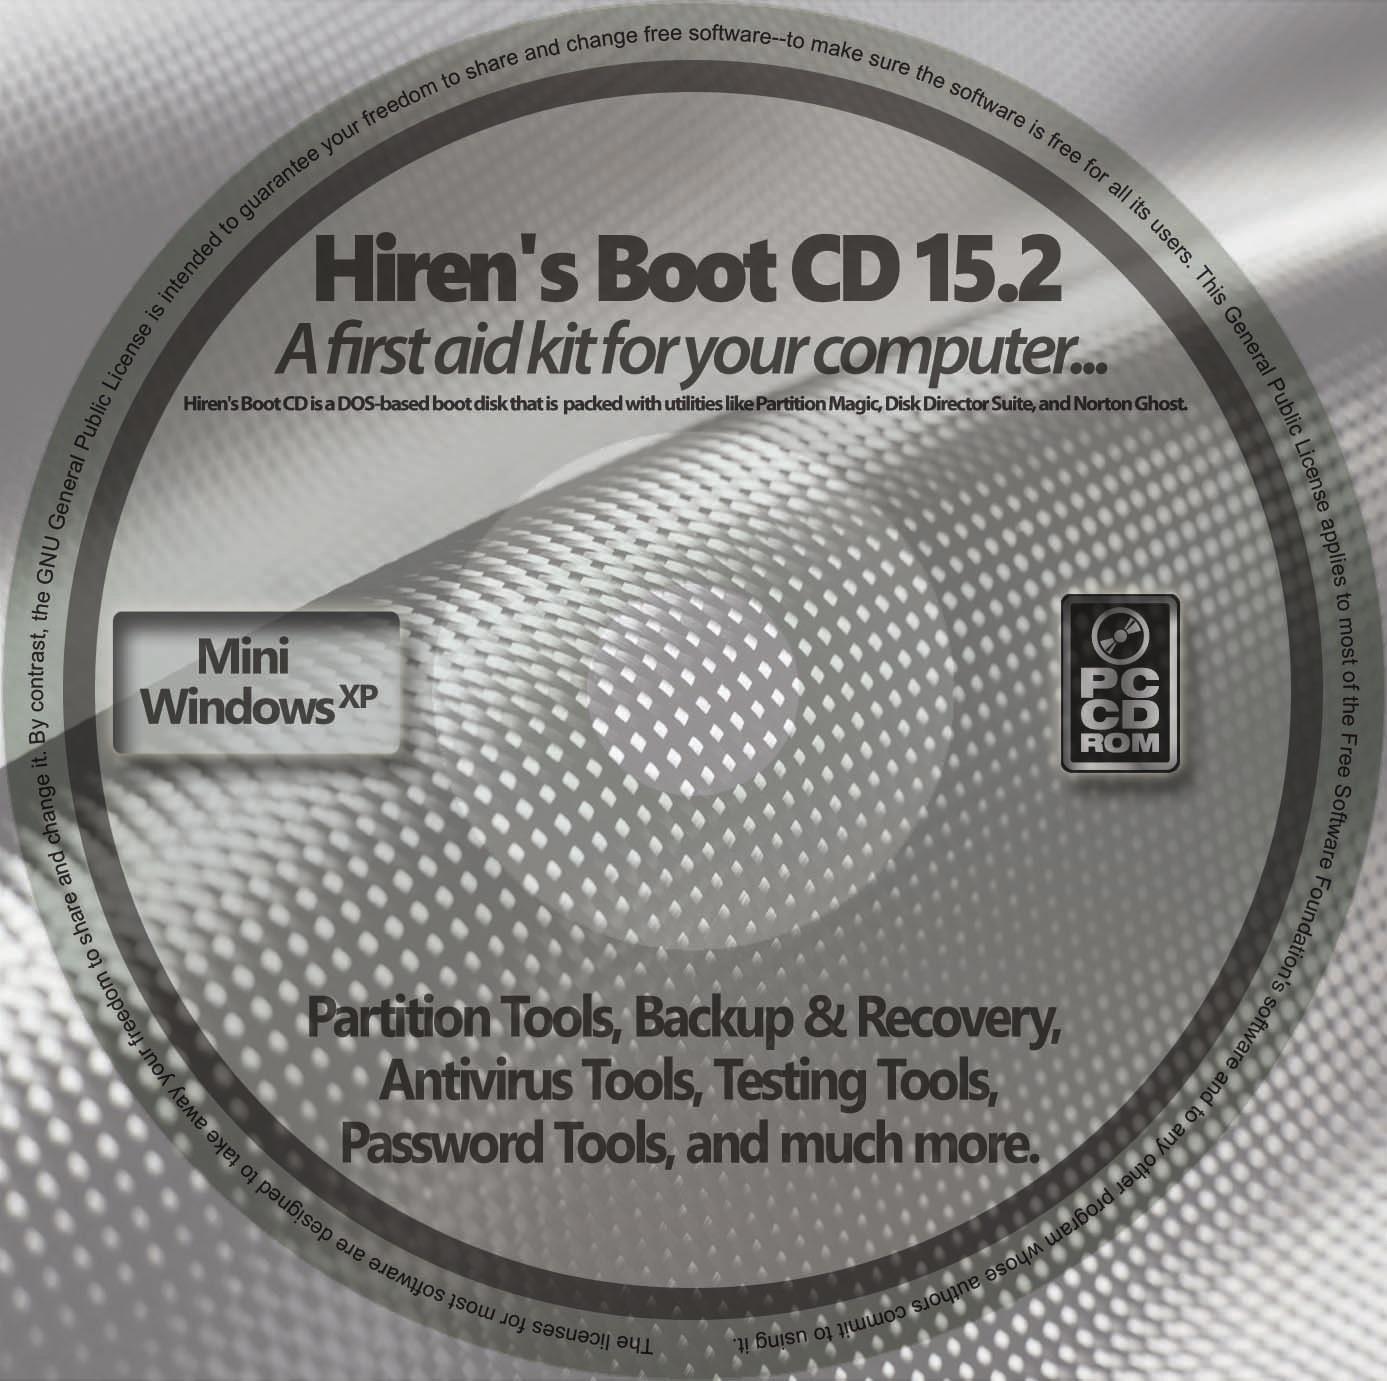 hirens boot cd 15.2 download